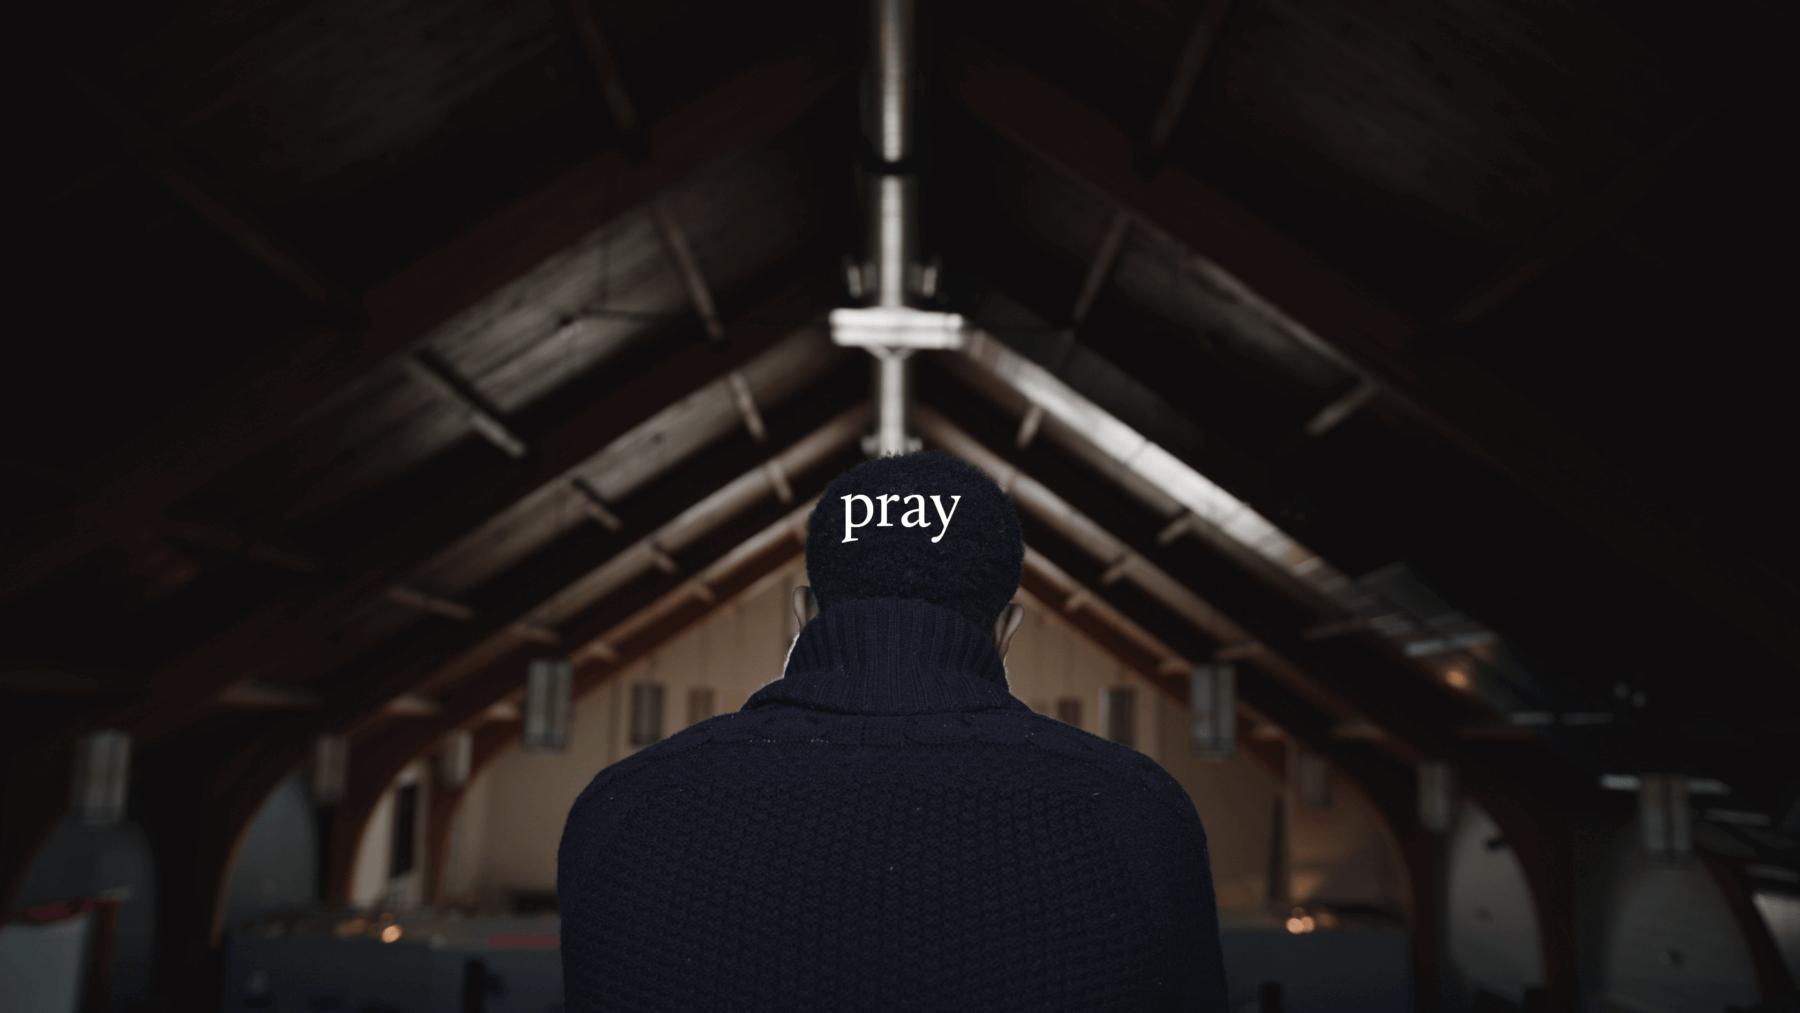 Sermon Series Ideas #3: Pray